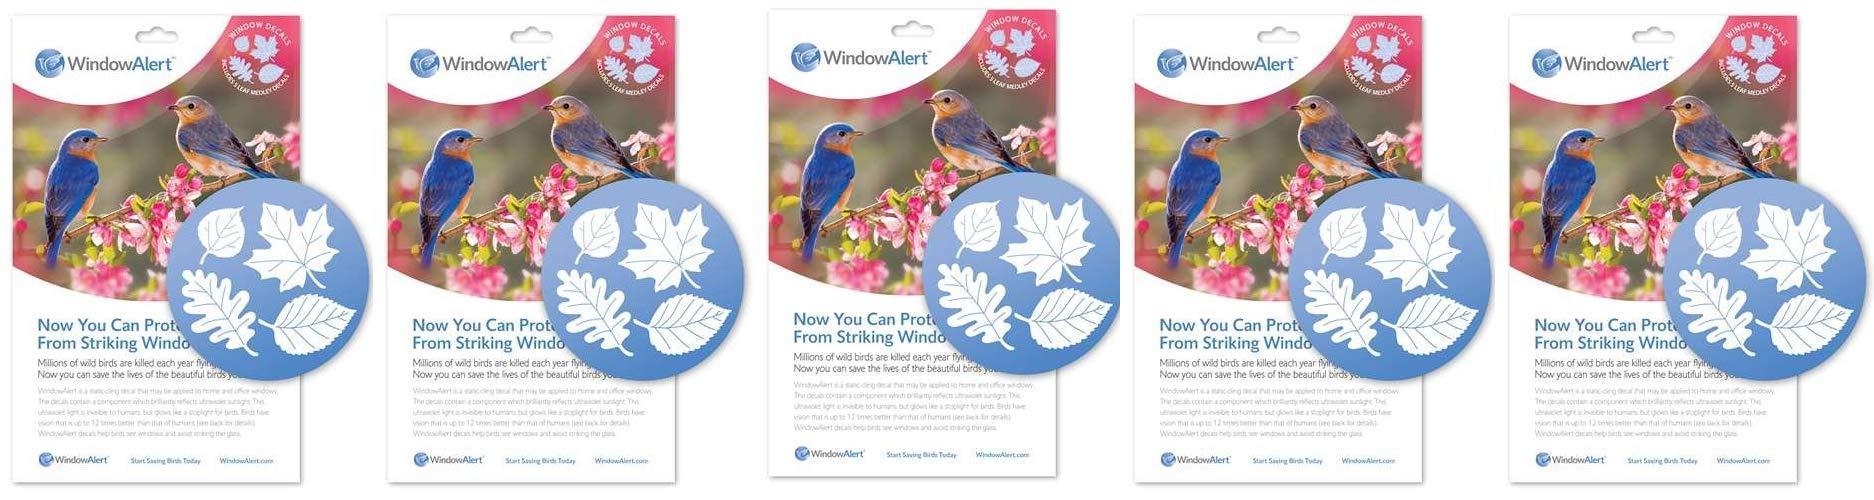 Window Alert Leaf Medley Decals (5-Pack)